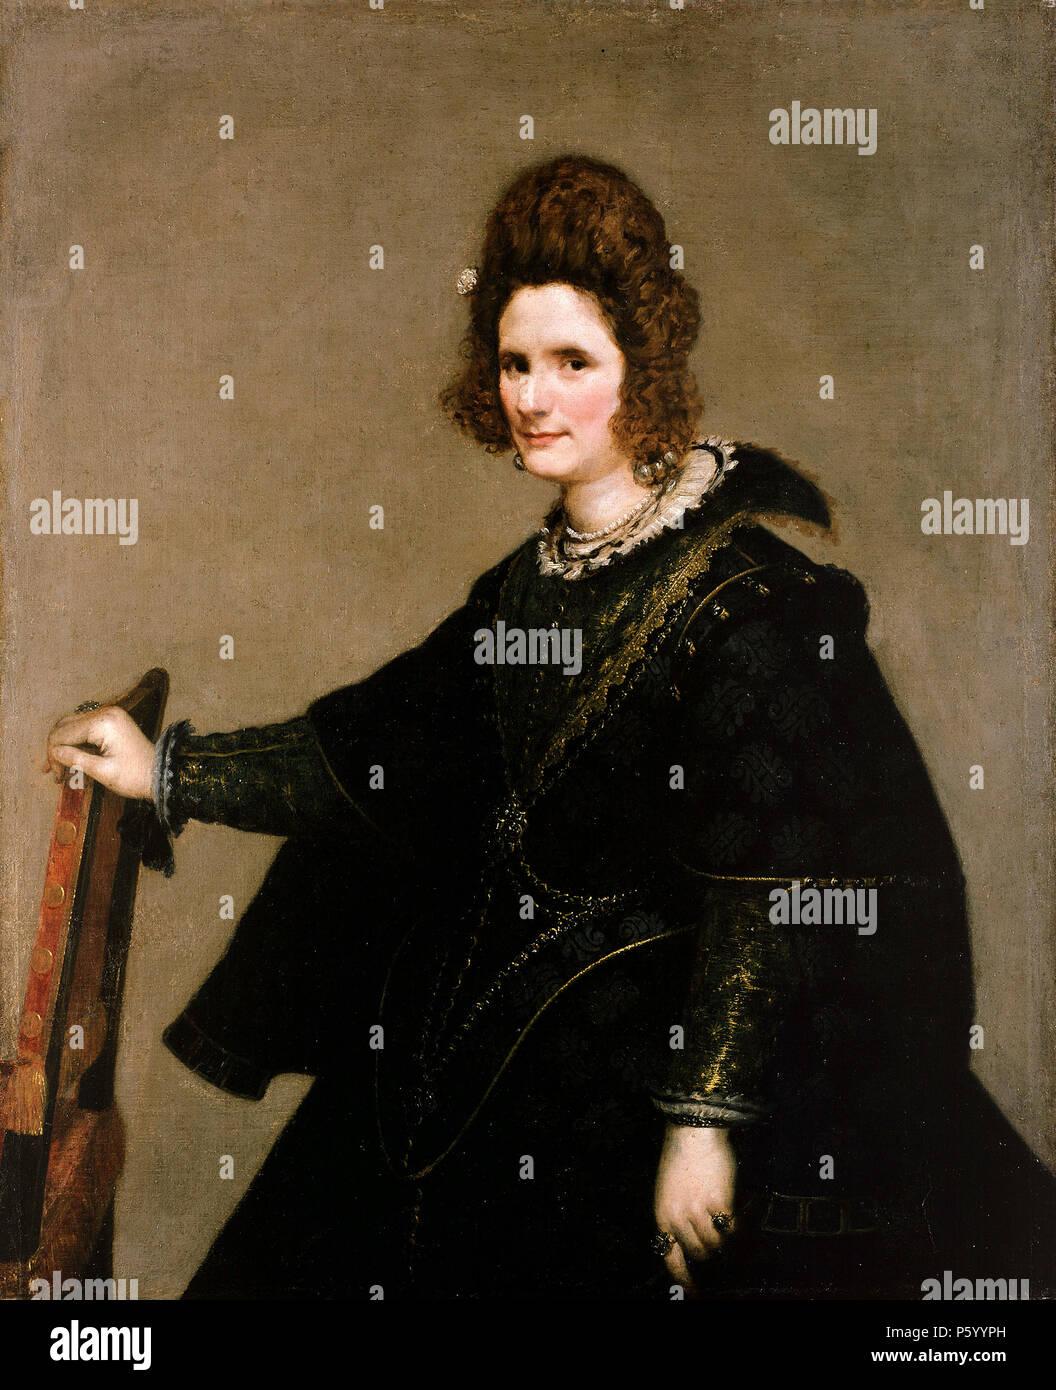 Dama de corte, 1635 por Diego Velázquez Imagen De Stock